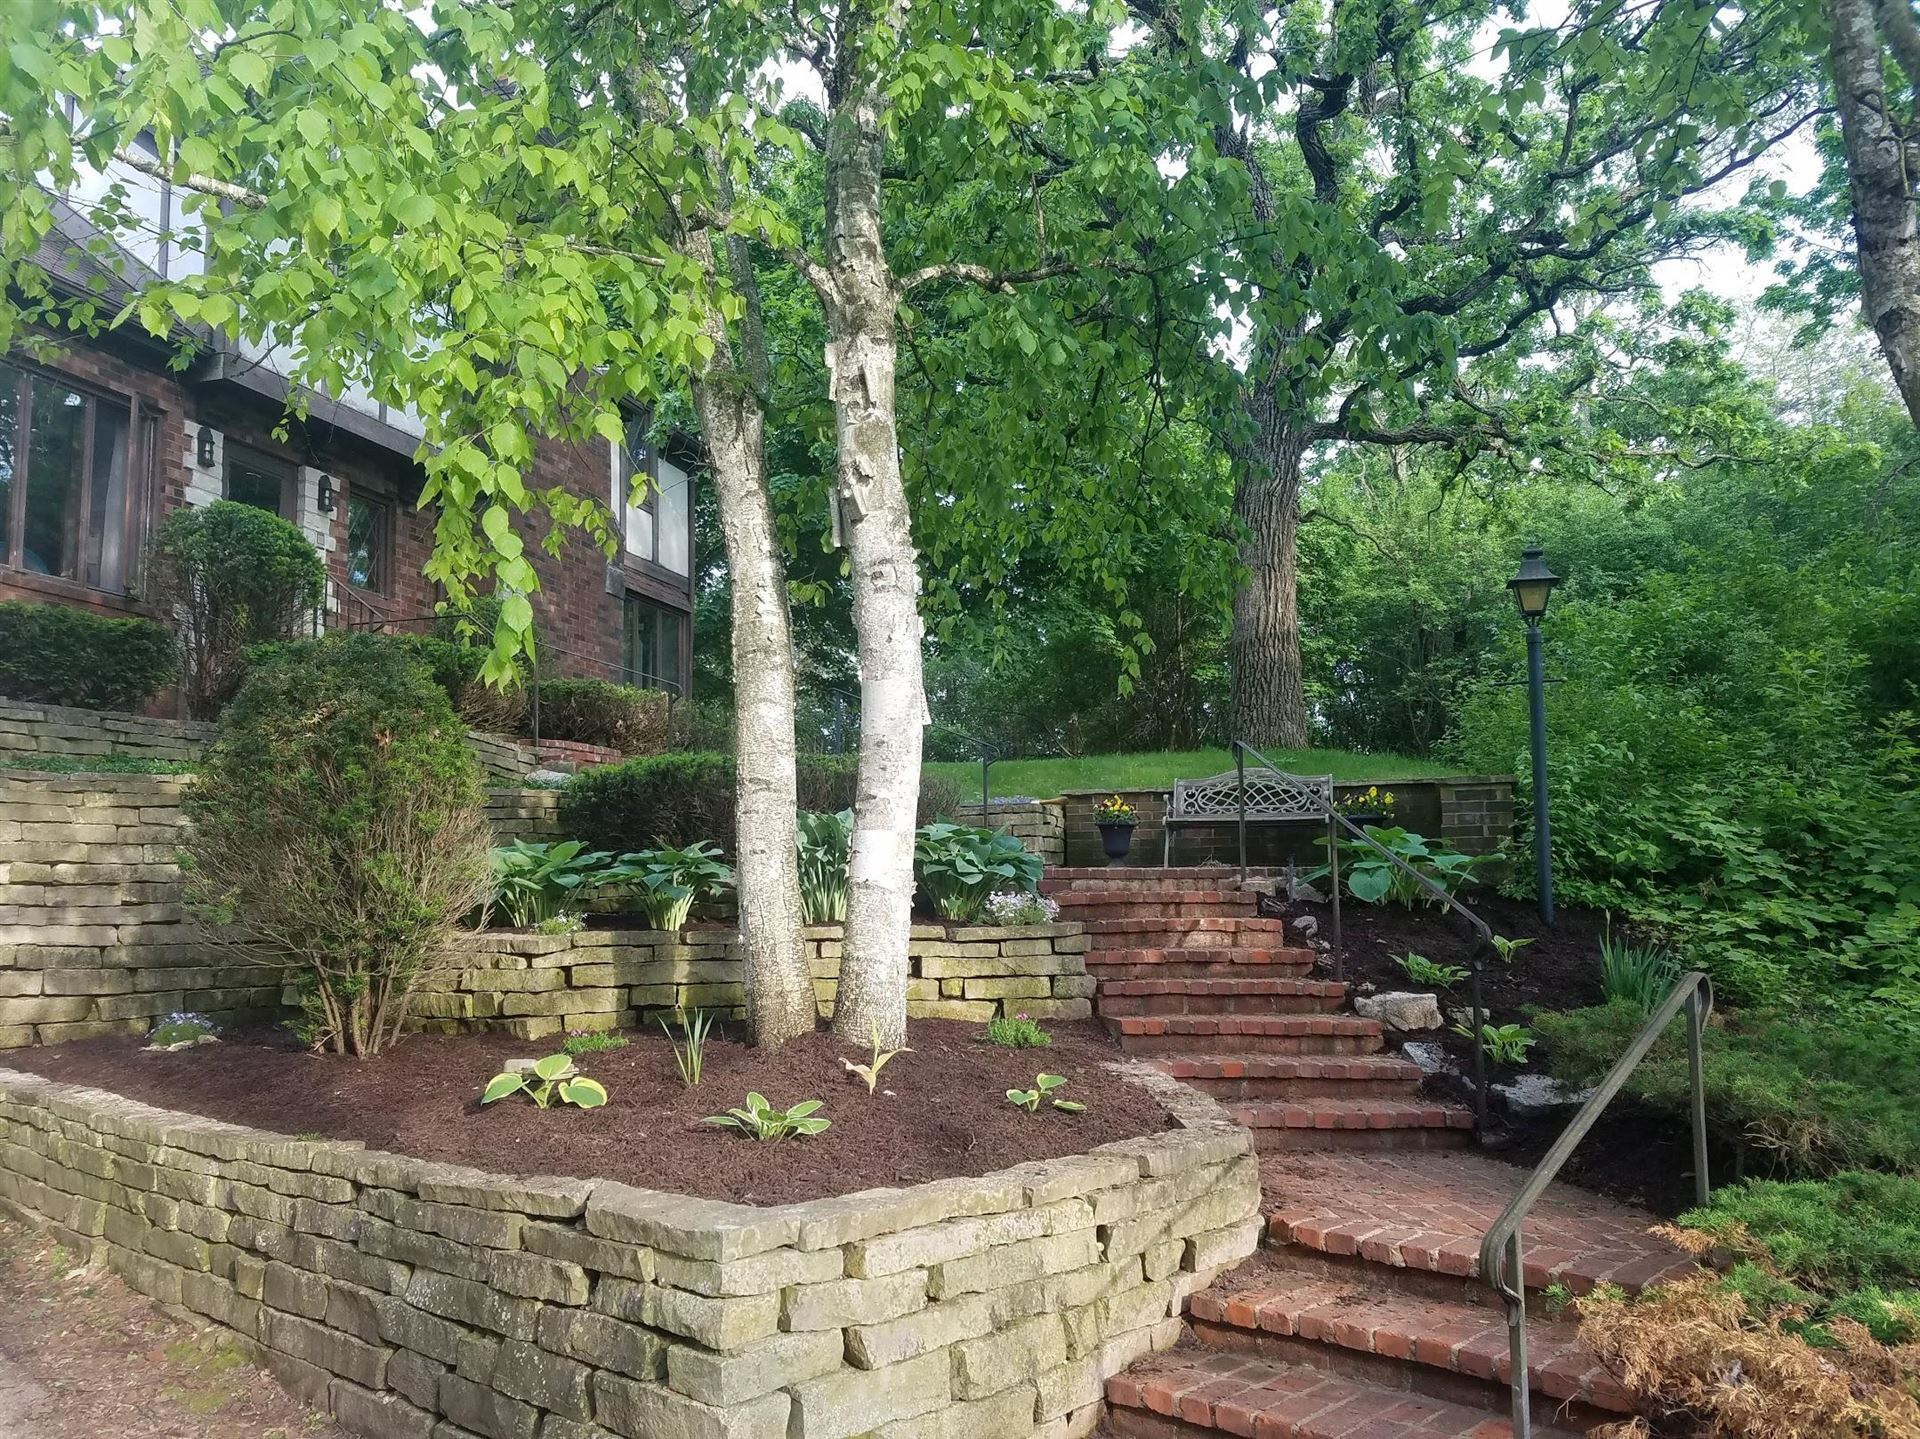 W342S4844 Moraine Hills Dr, Ottawa, WI 53118 - #: 1683983